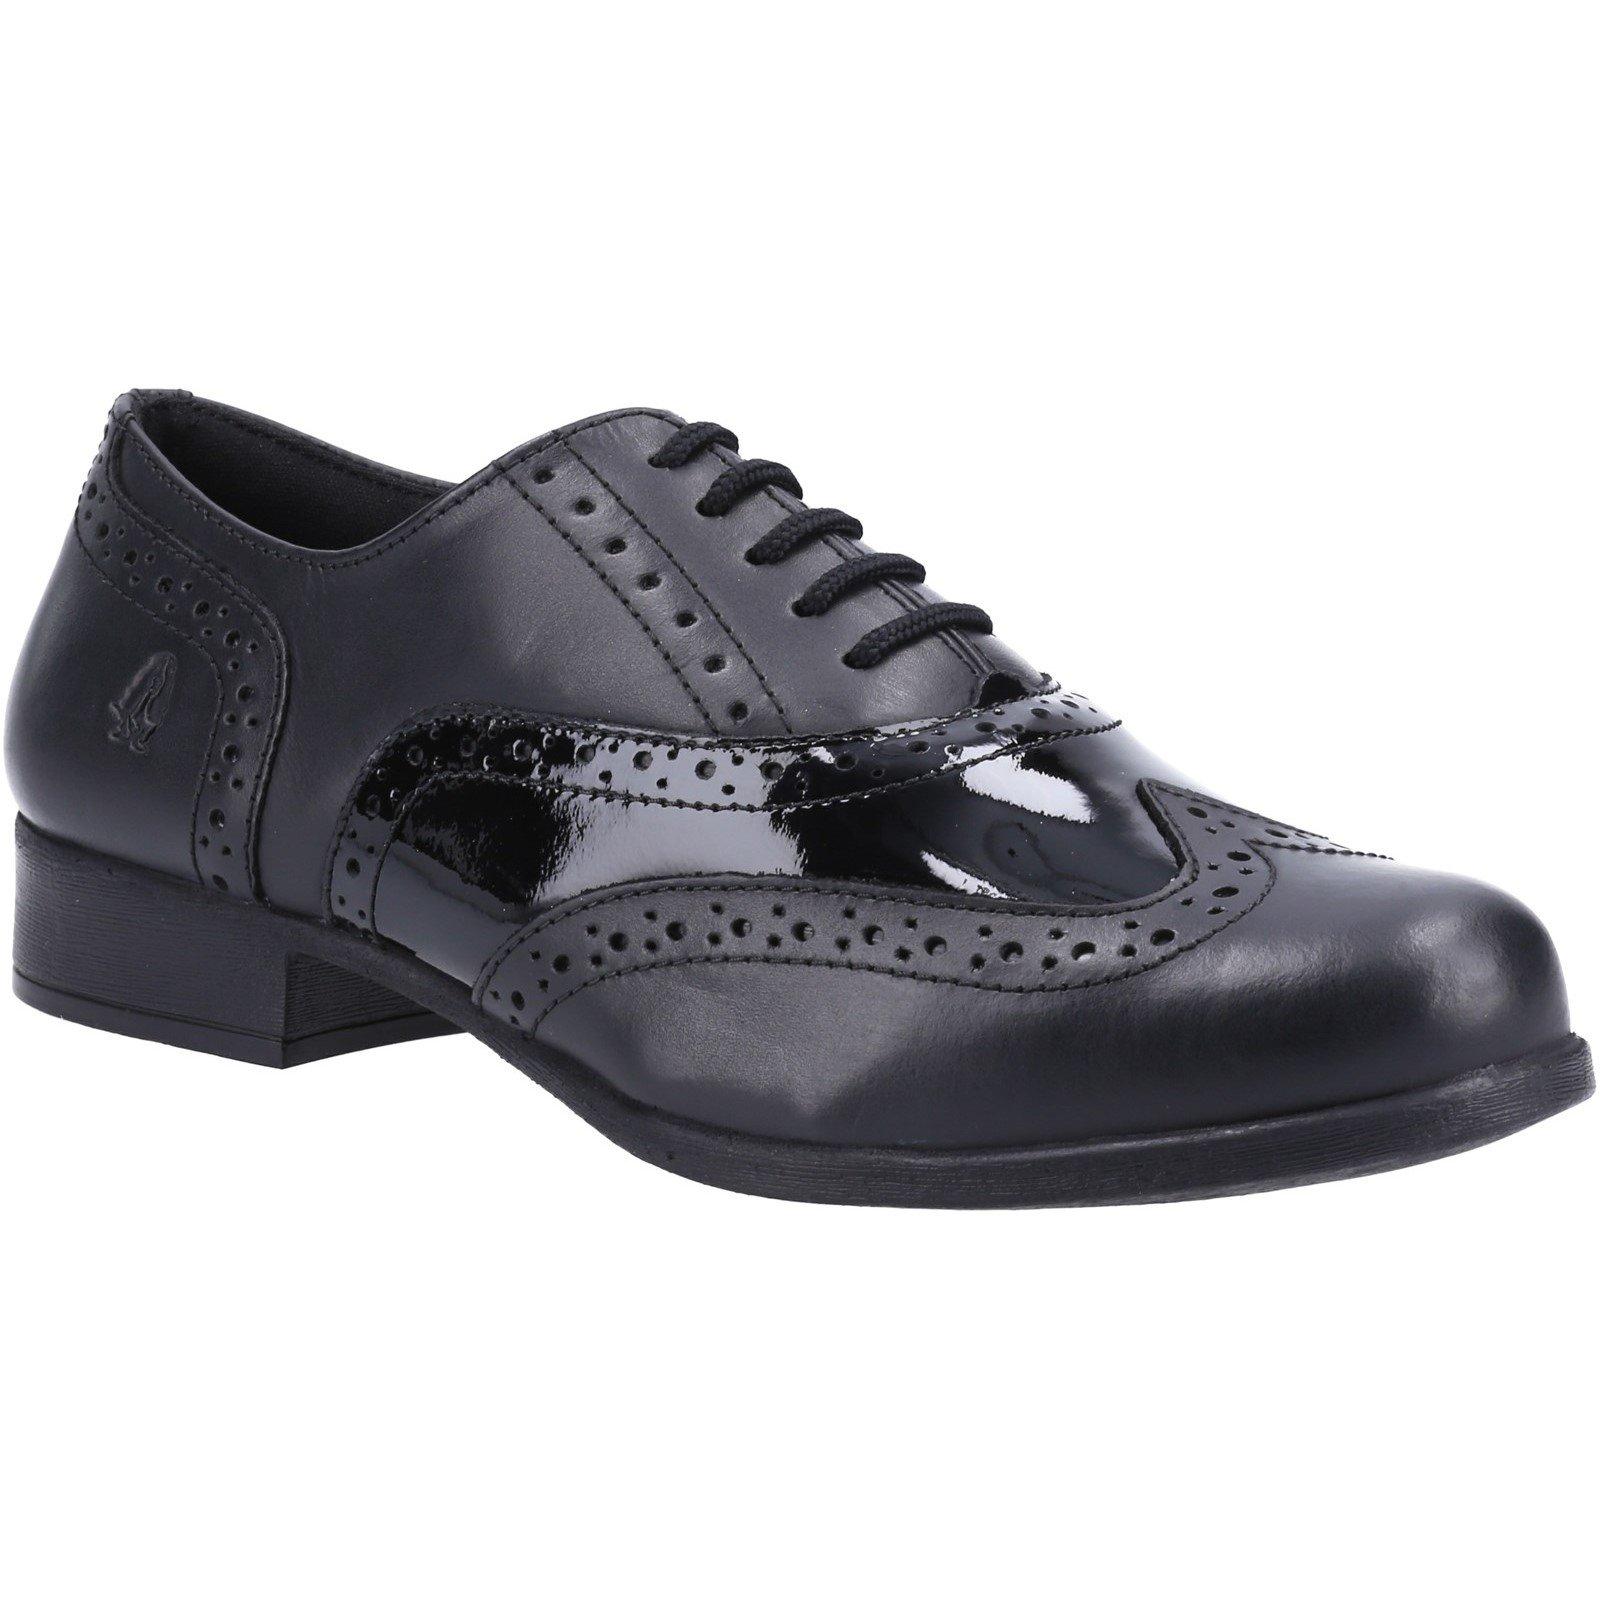 Hush Puppies Kid's Kada Senior School Brogue Shoe Black 33193 - Black 7